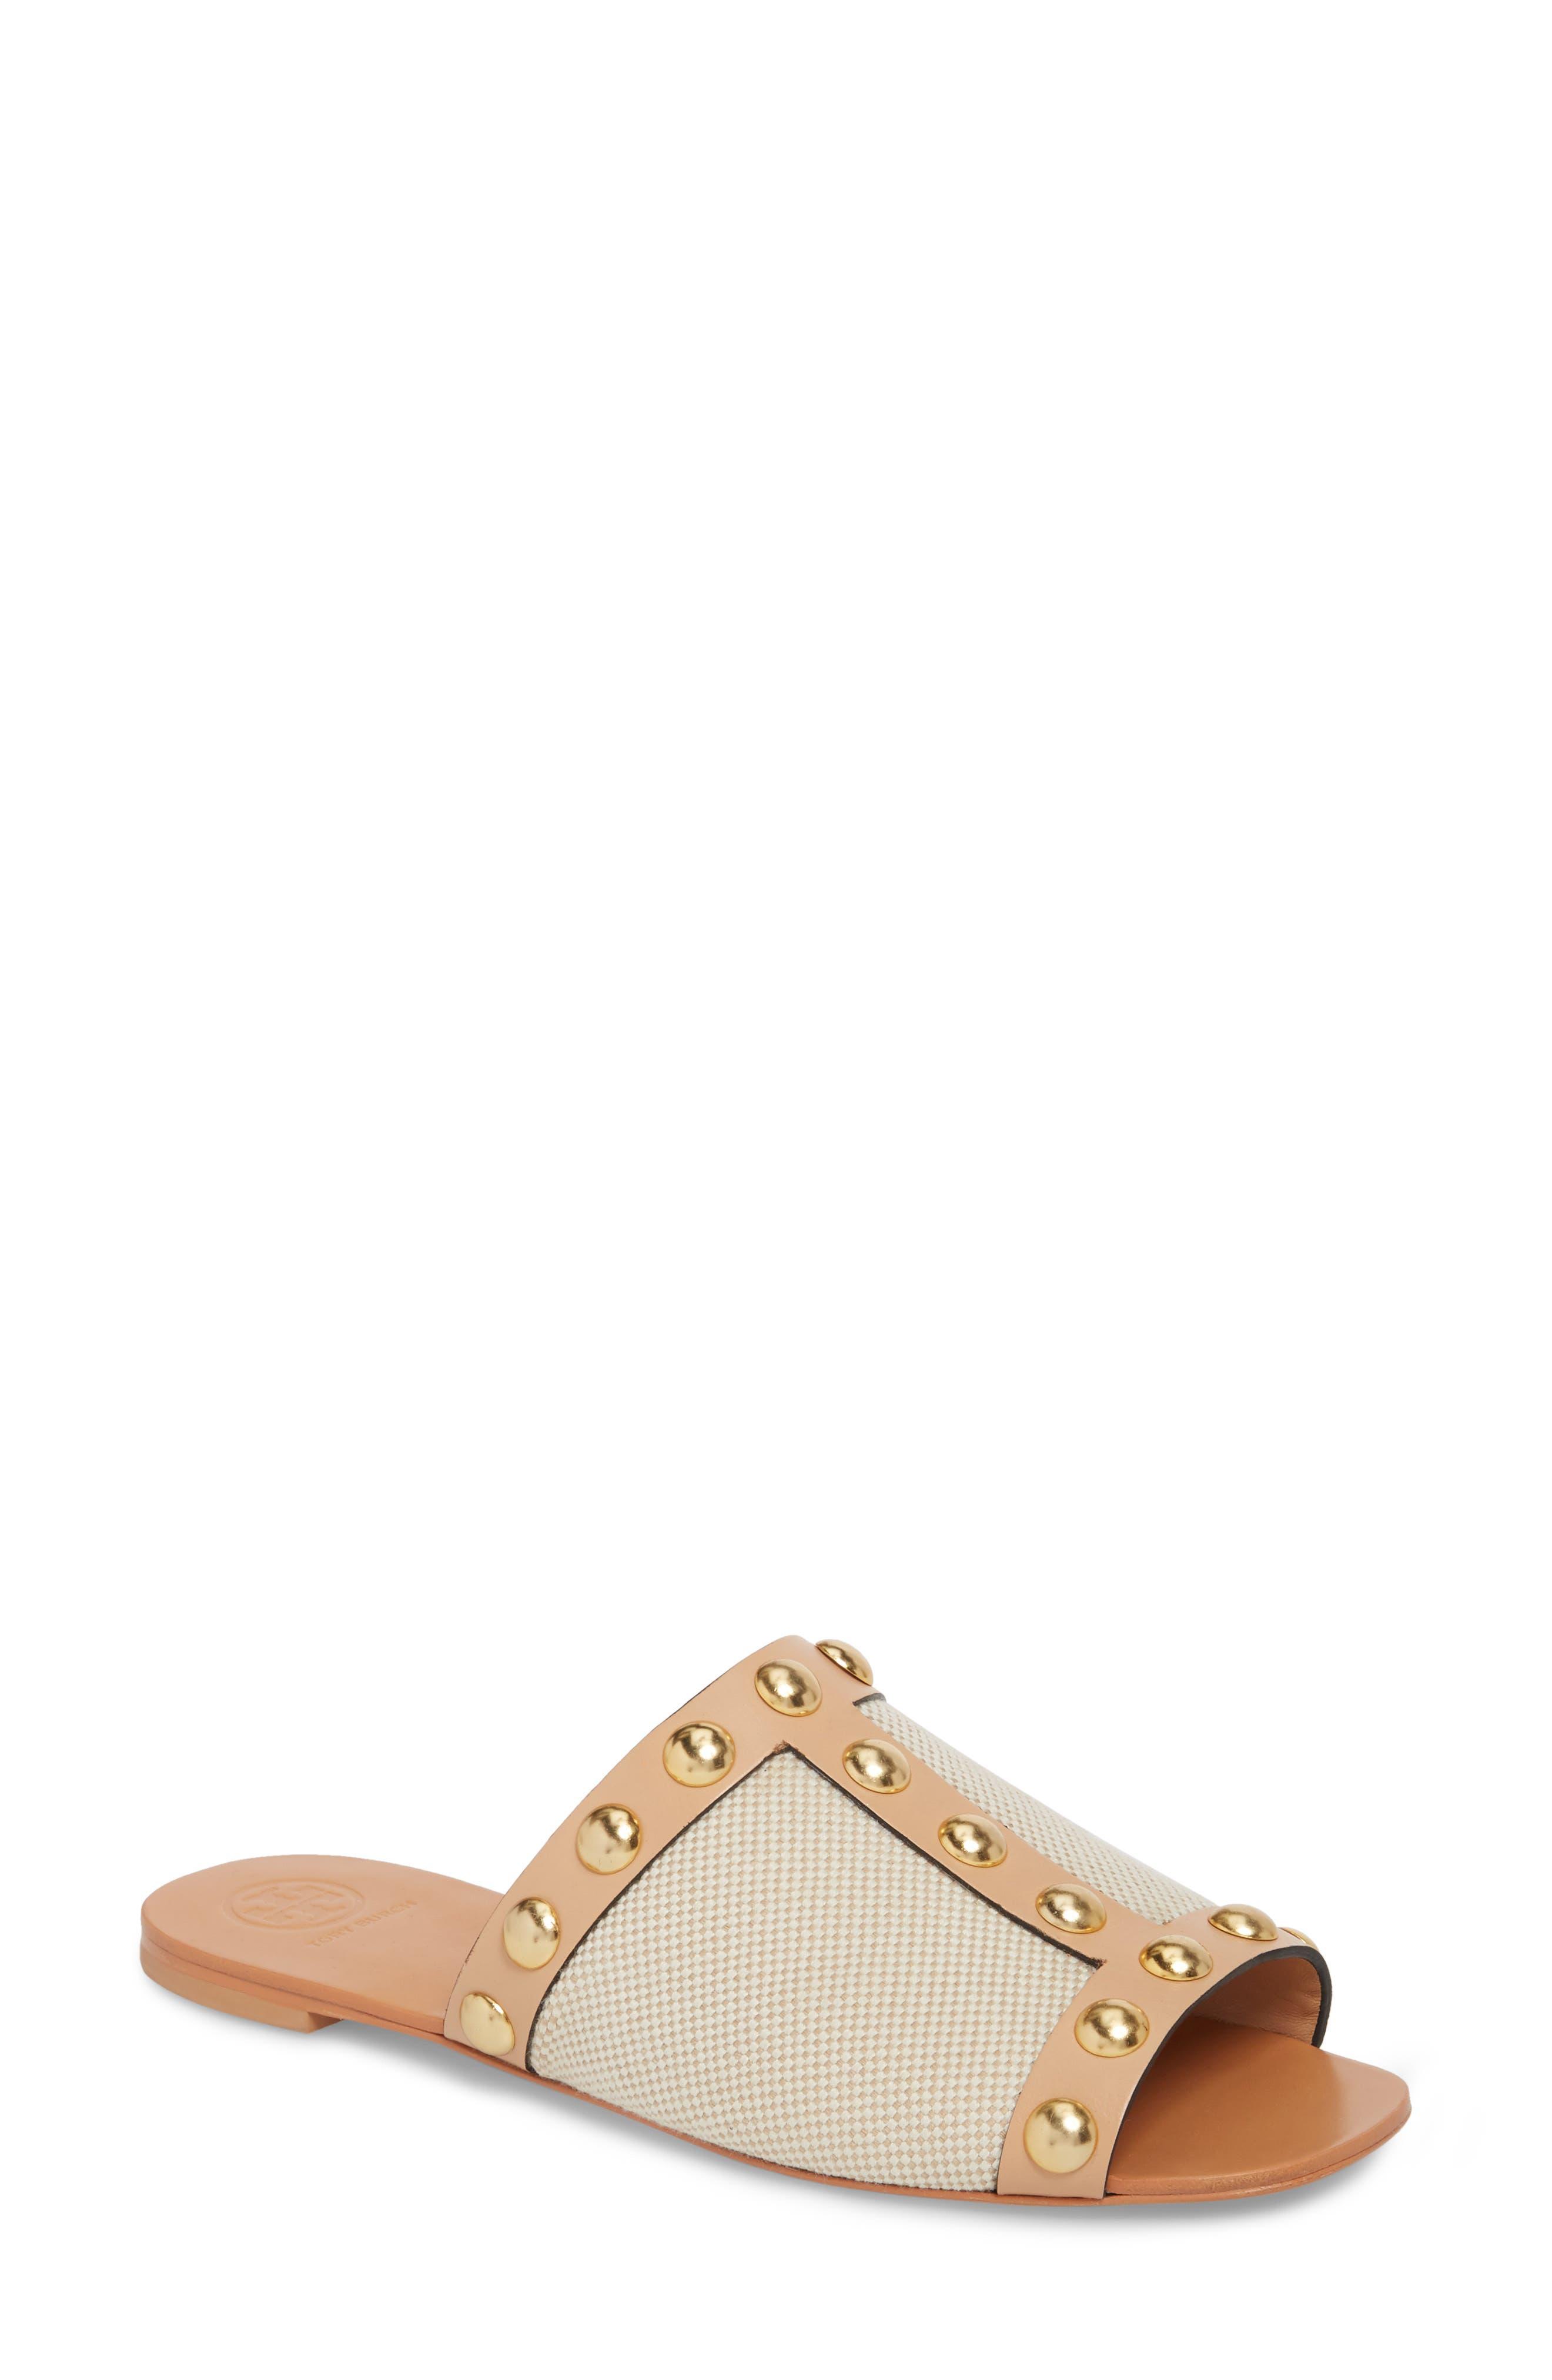 Blythe Slide Sandal,                         Main,                         color, Sand/ Natural Vachetta